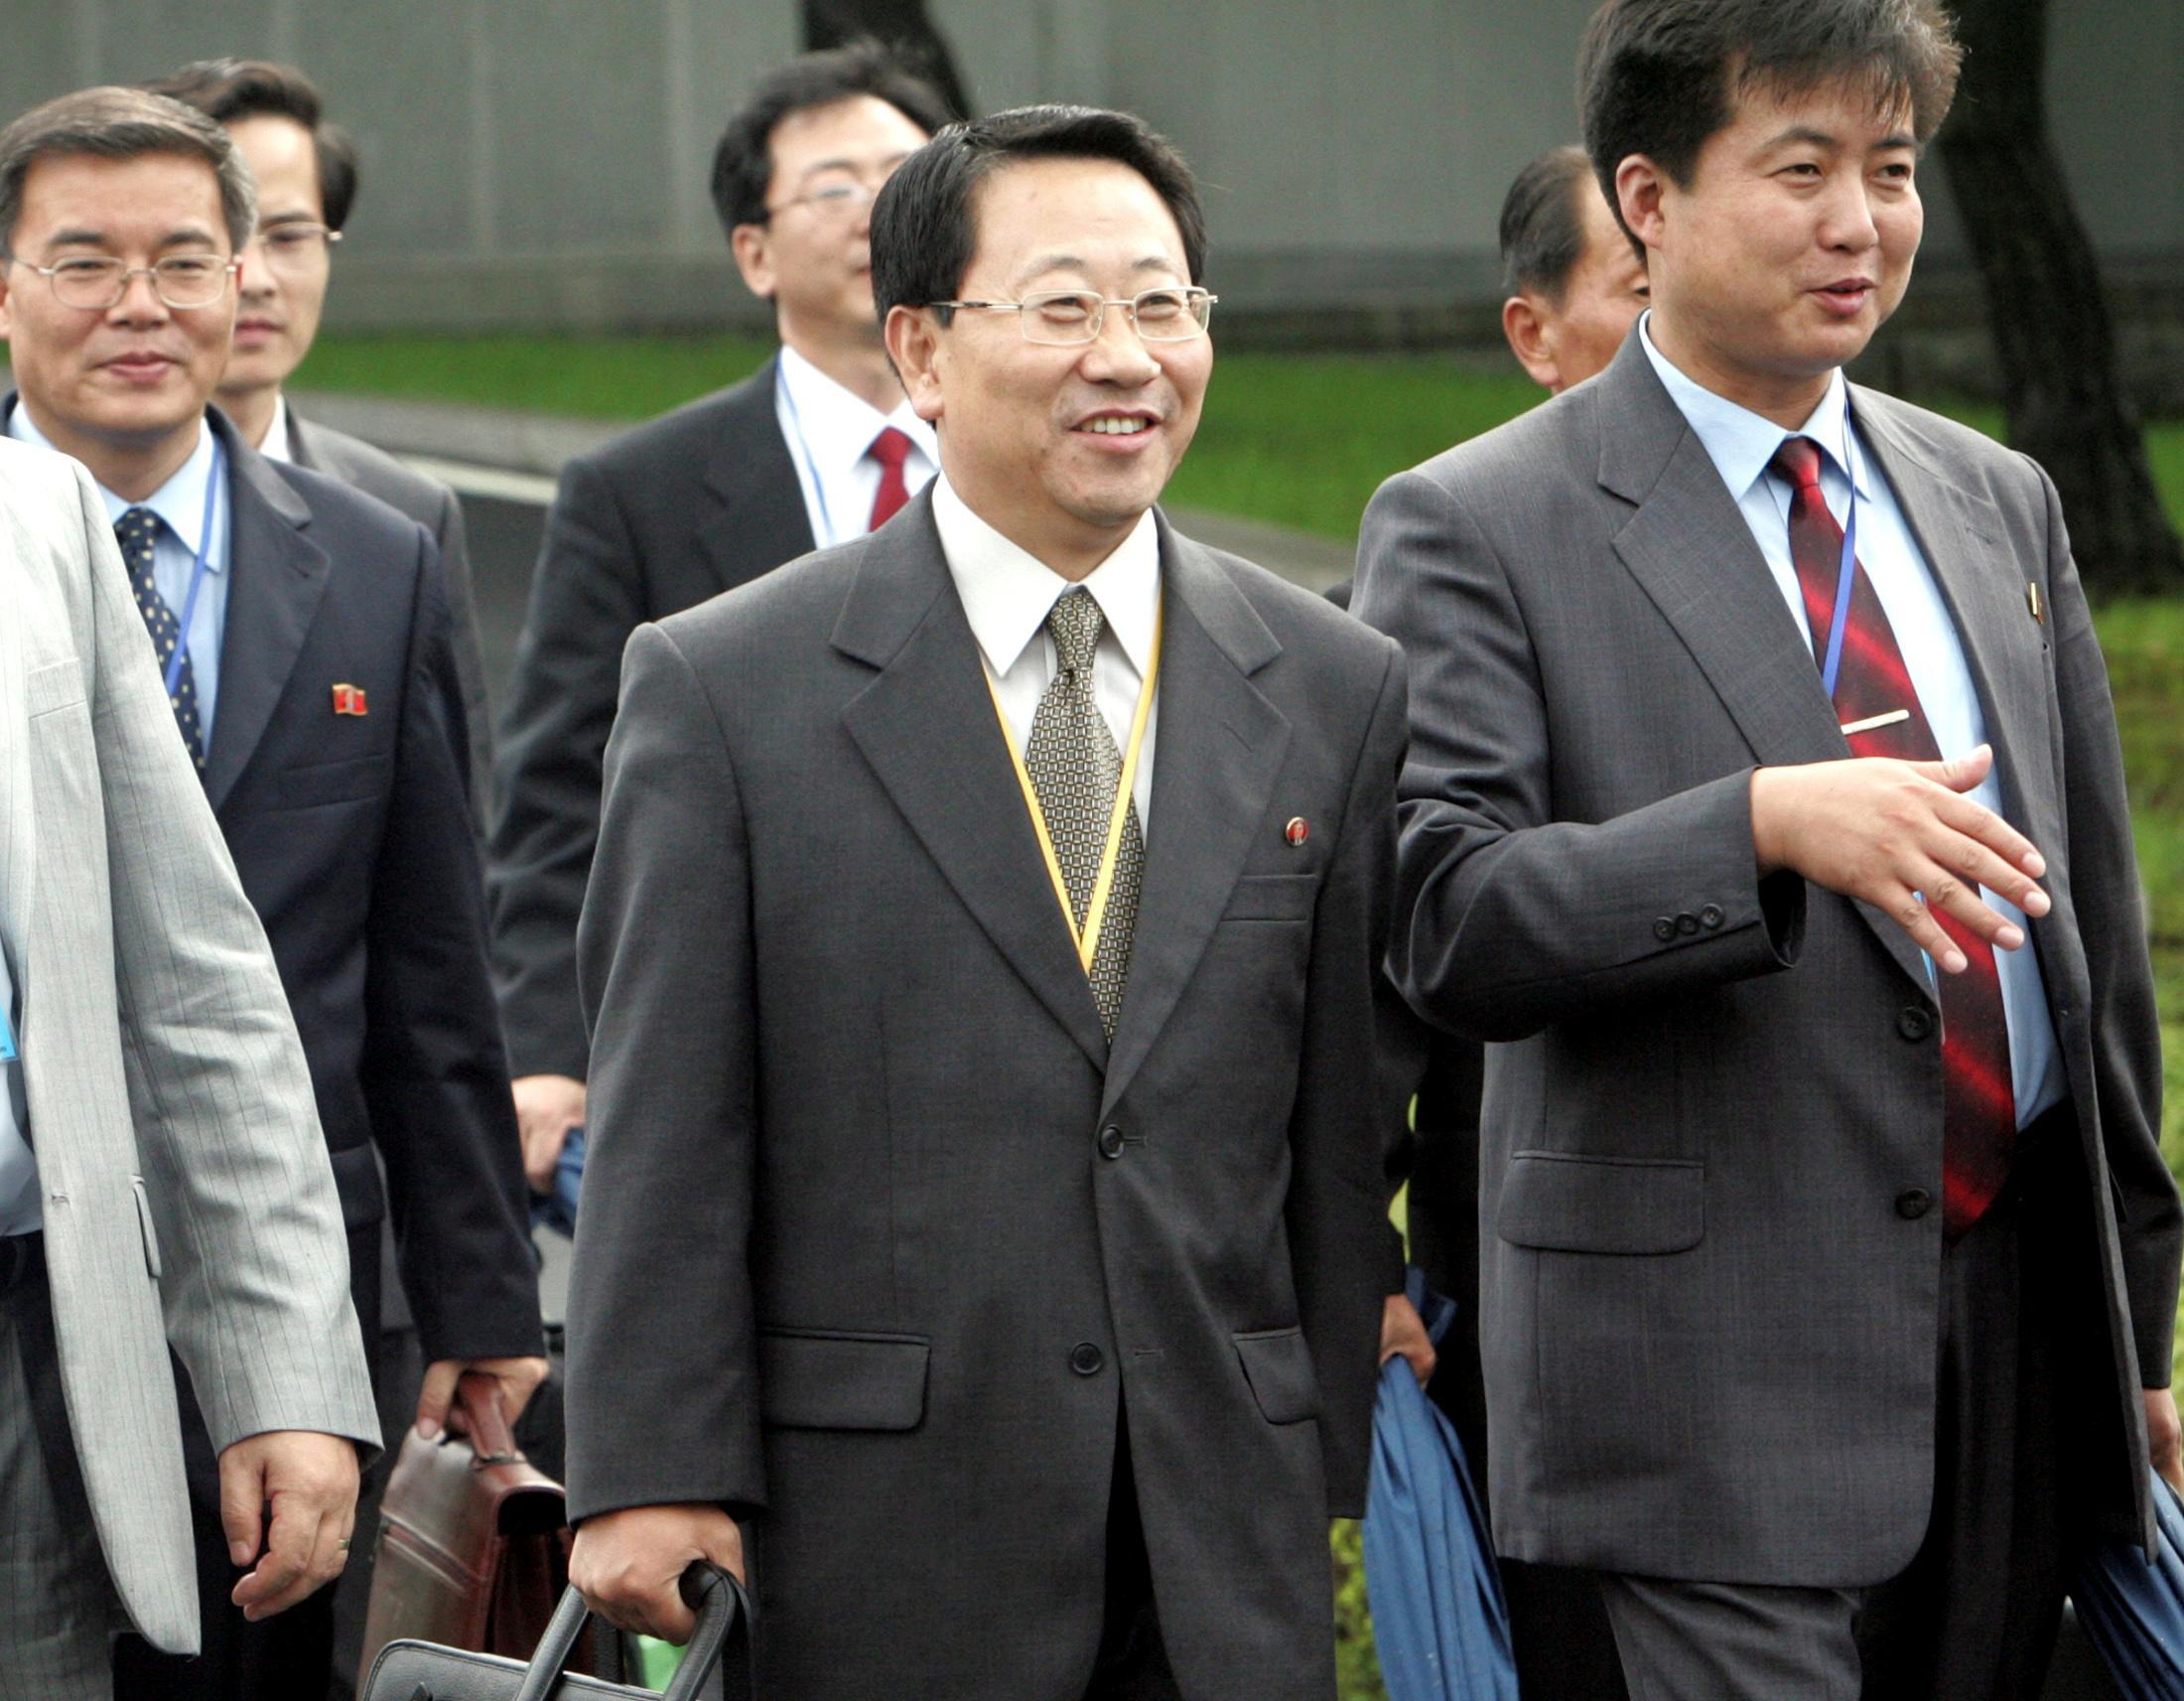 Former ambassador may be North Korea's new point man in U.S. talks:...